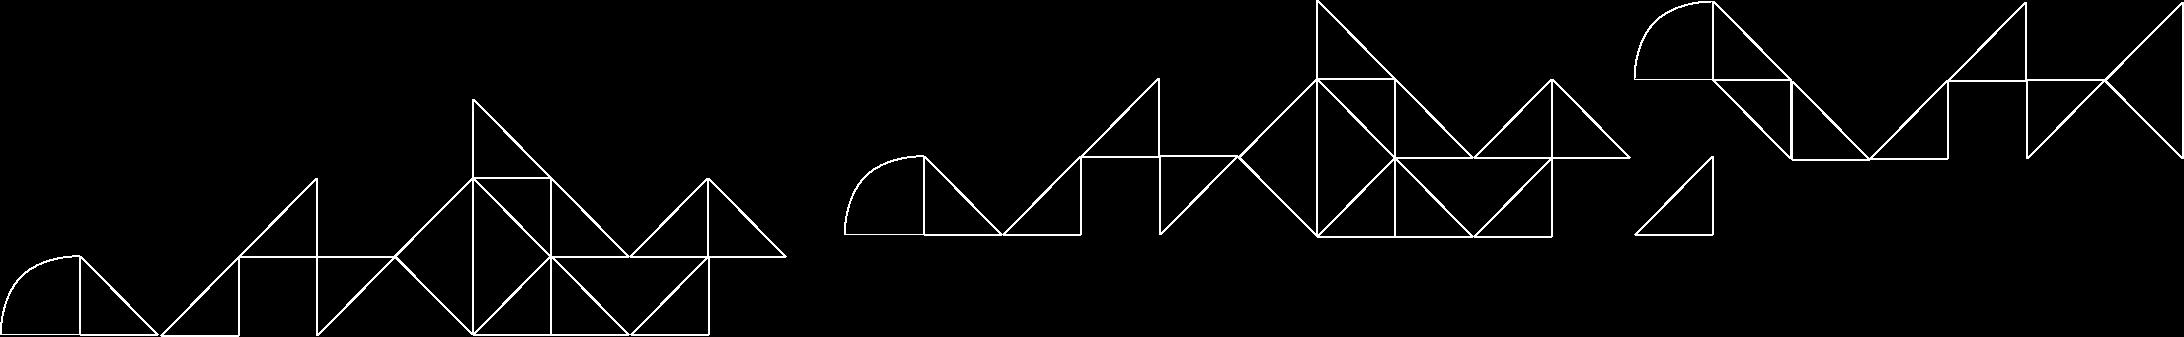 pattern-outline